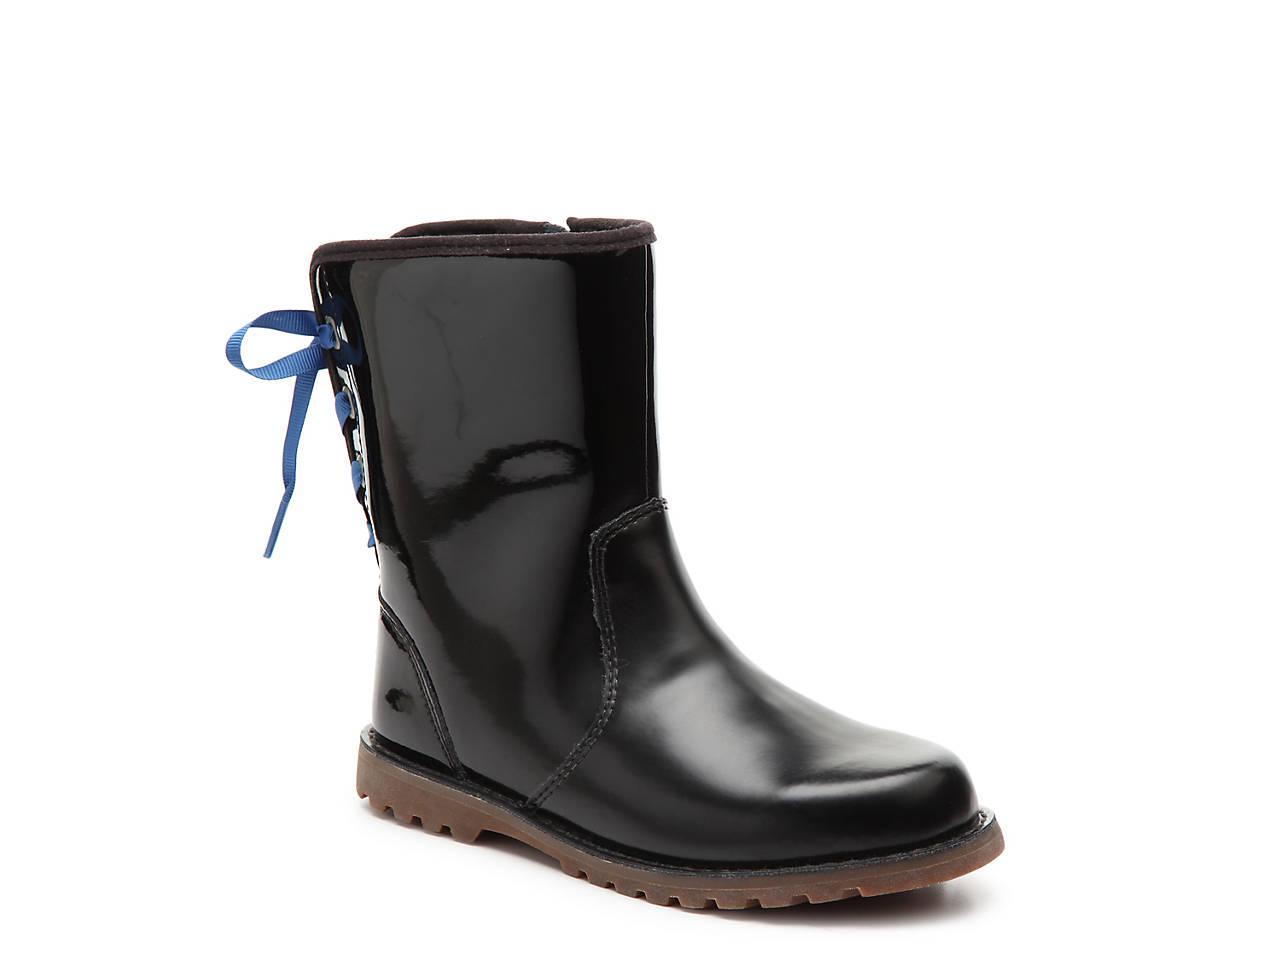 3ce1c69010f Corene Toddler Boot